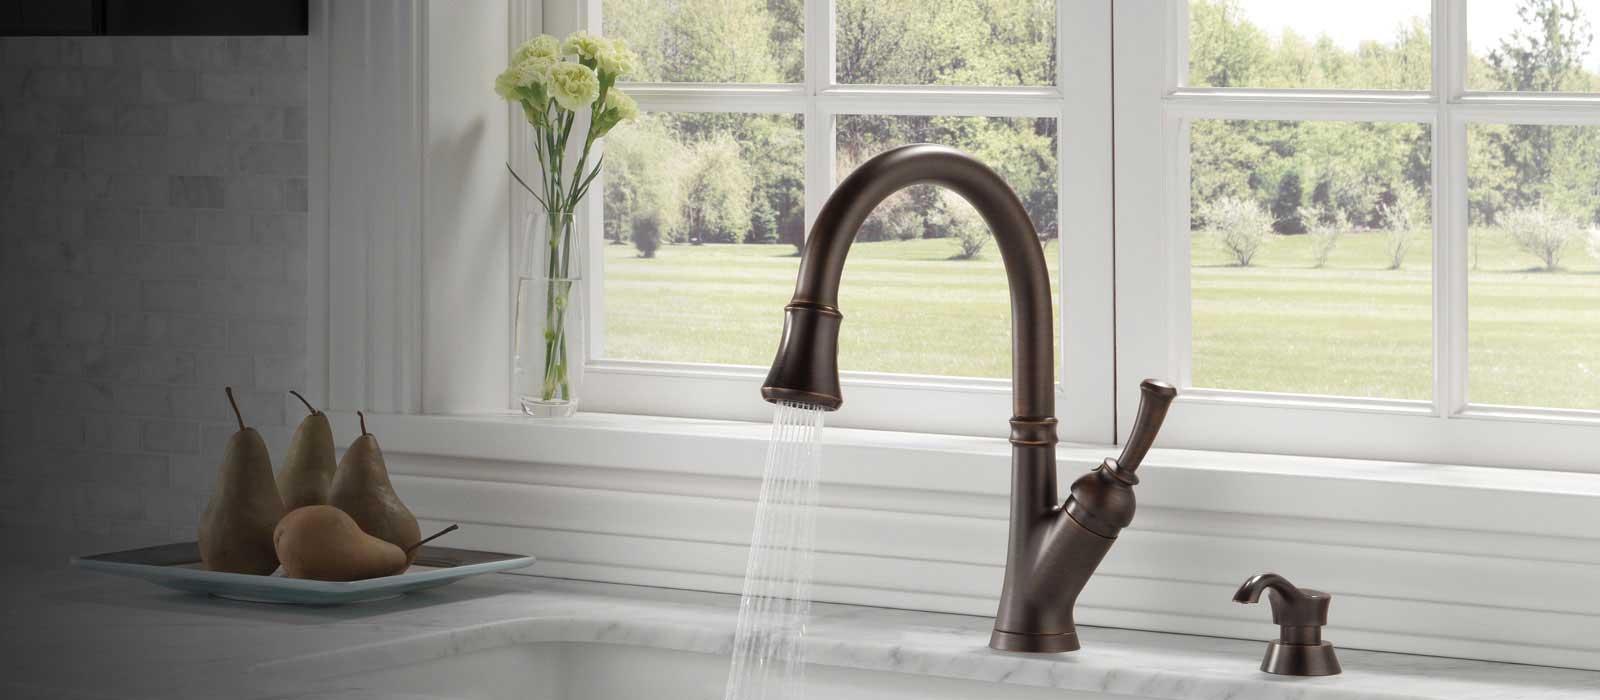 savile kitchen collection delta faucet